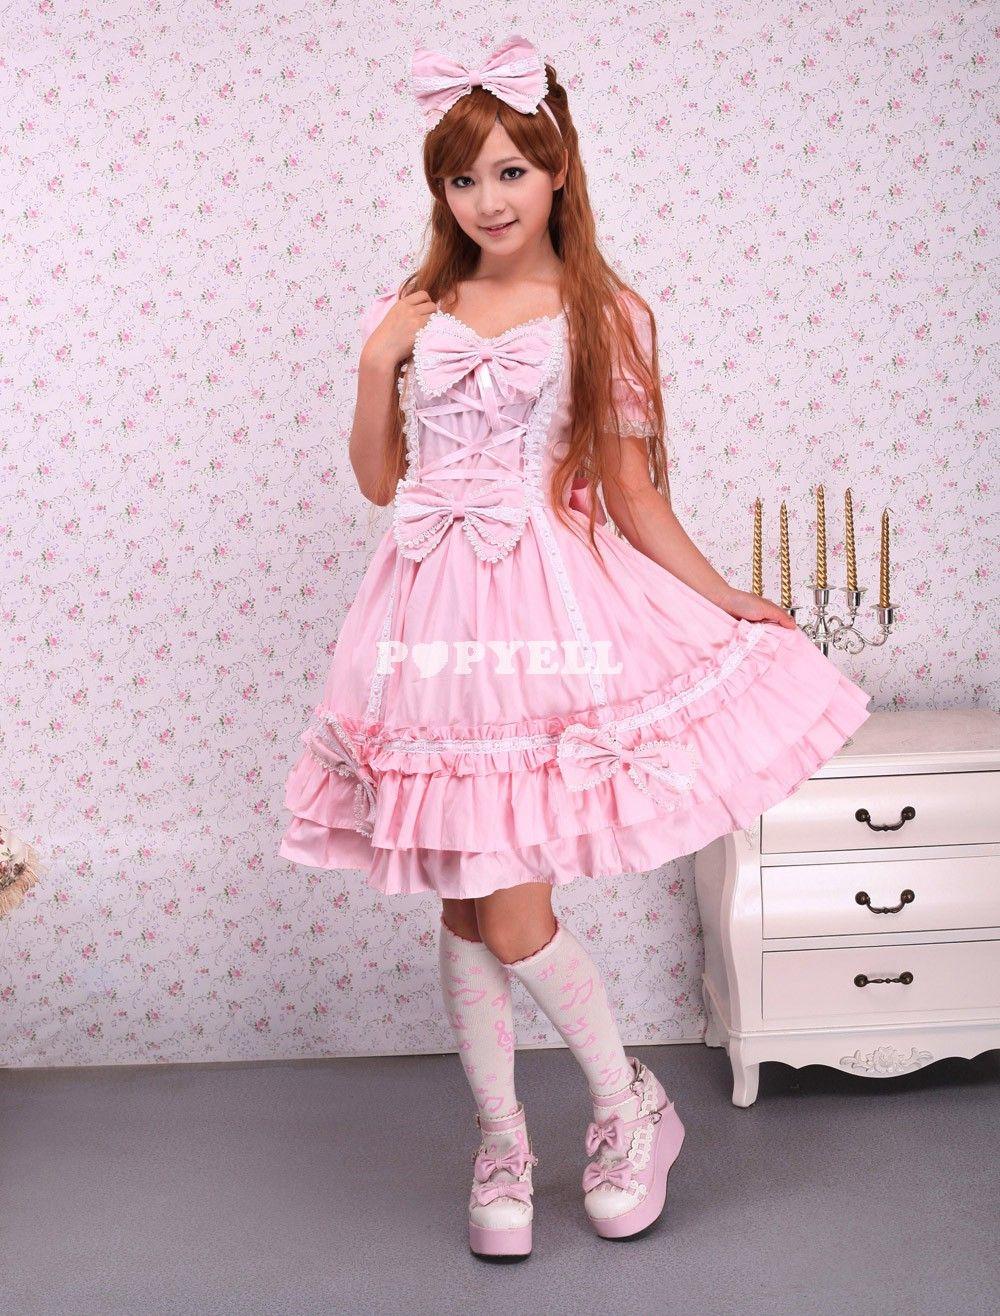 cotton pink cape sweet lolita dress 12659 1000 1316 fashions pinterest fashion. Black Bedroom Furniture Sets. Home Design Ideas